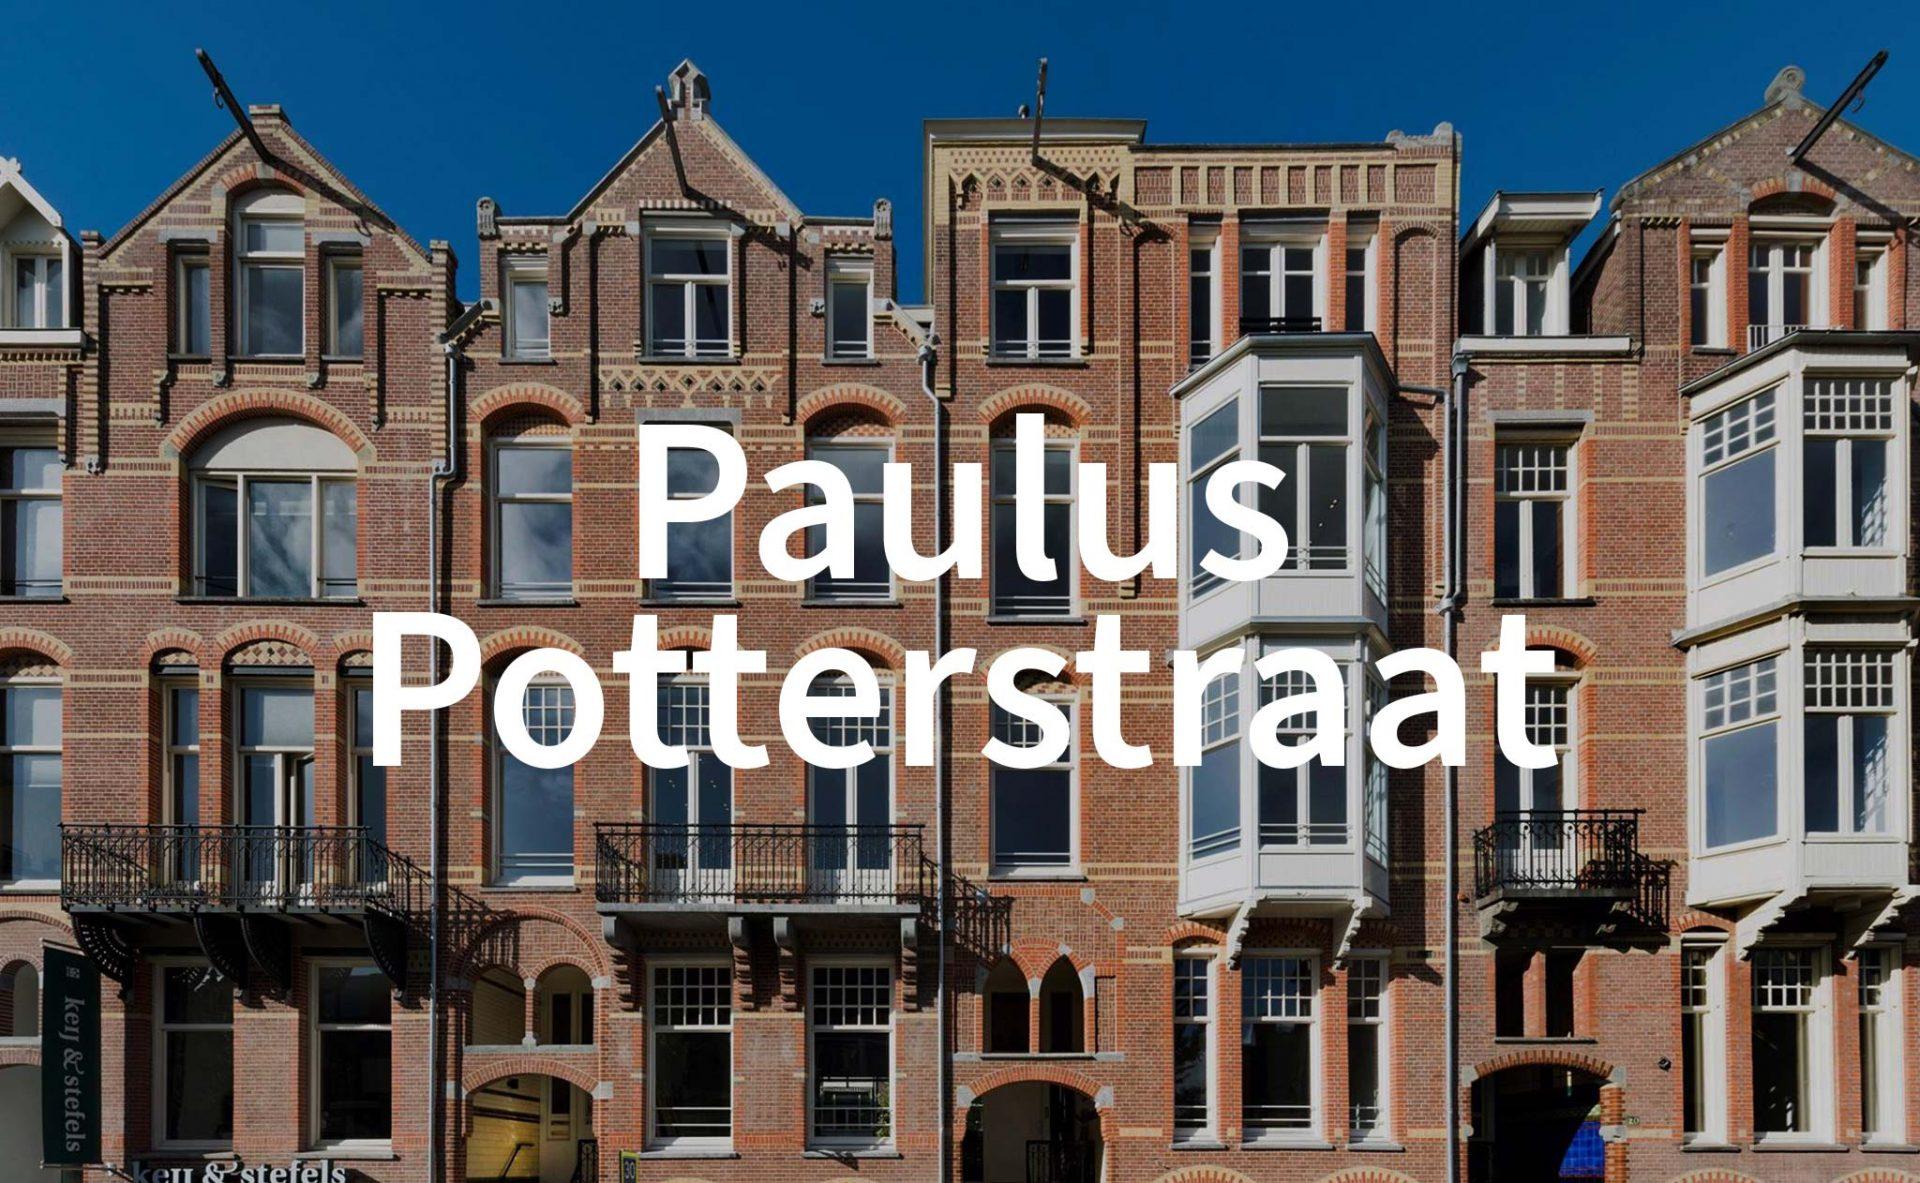 Paulus Potterstraat